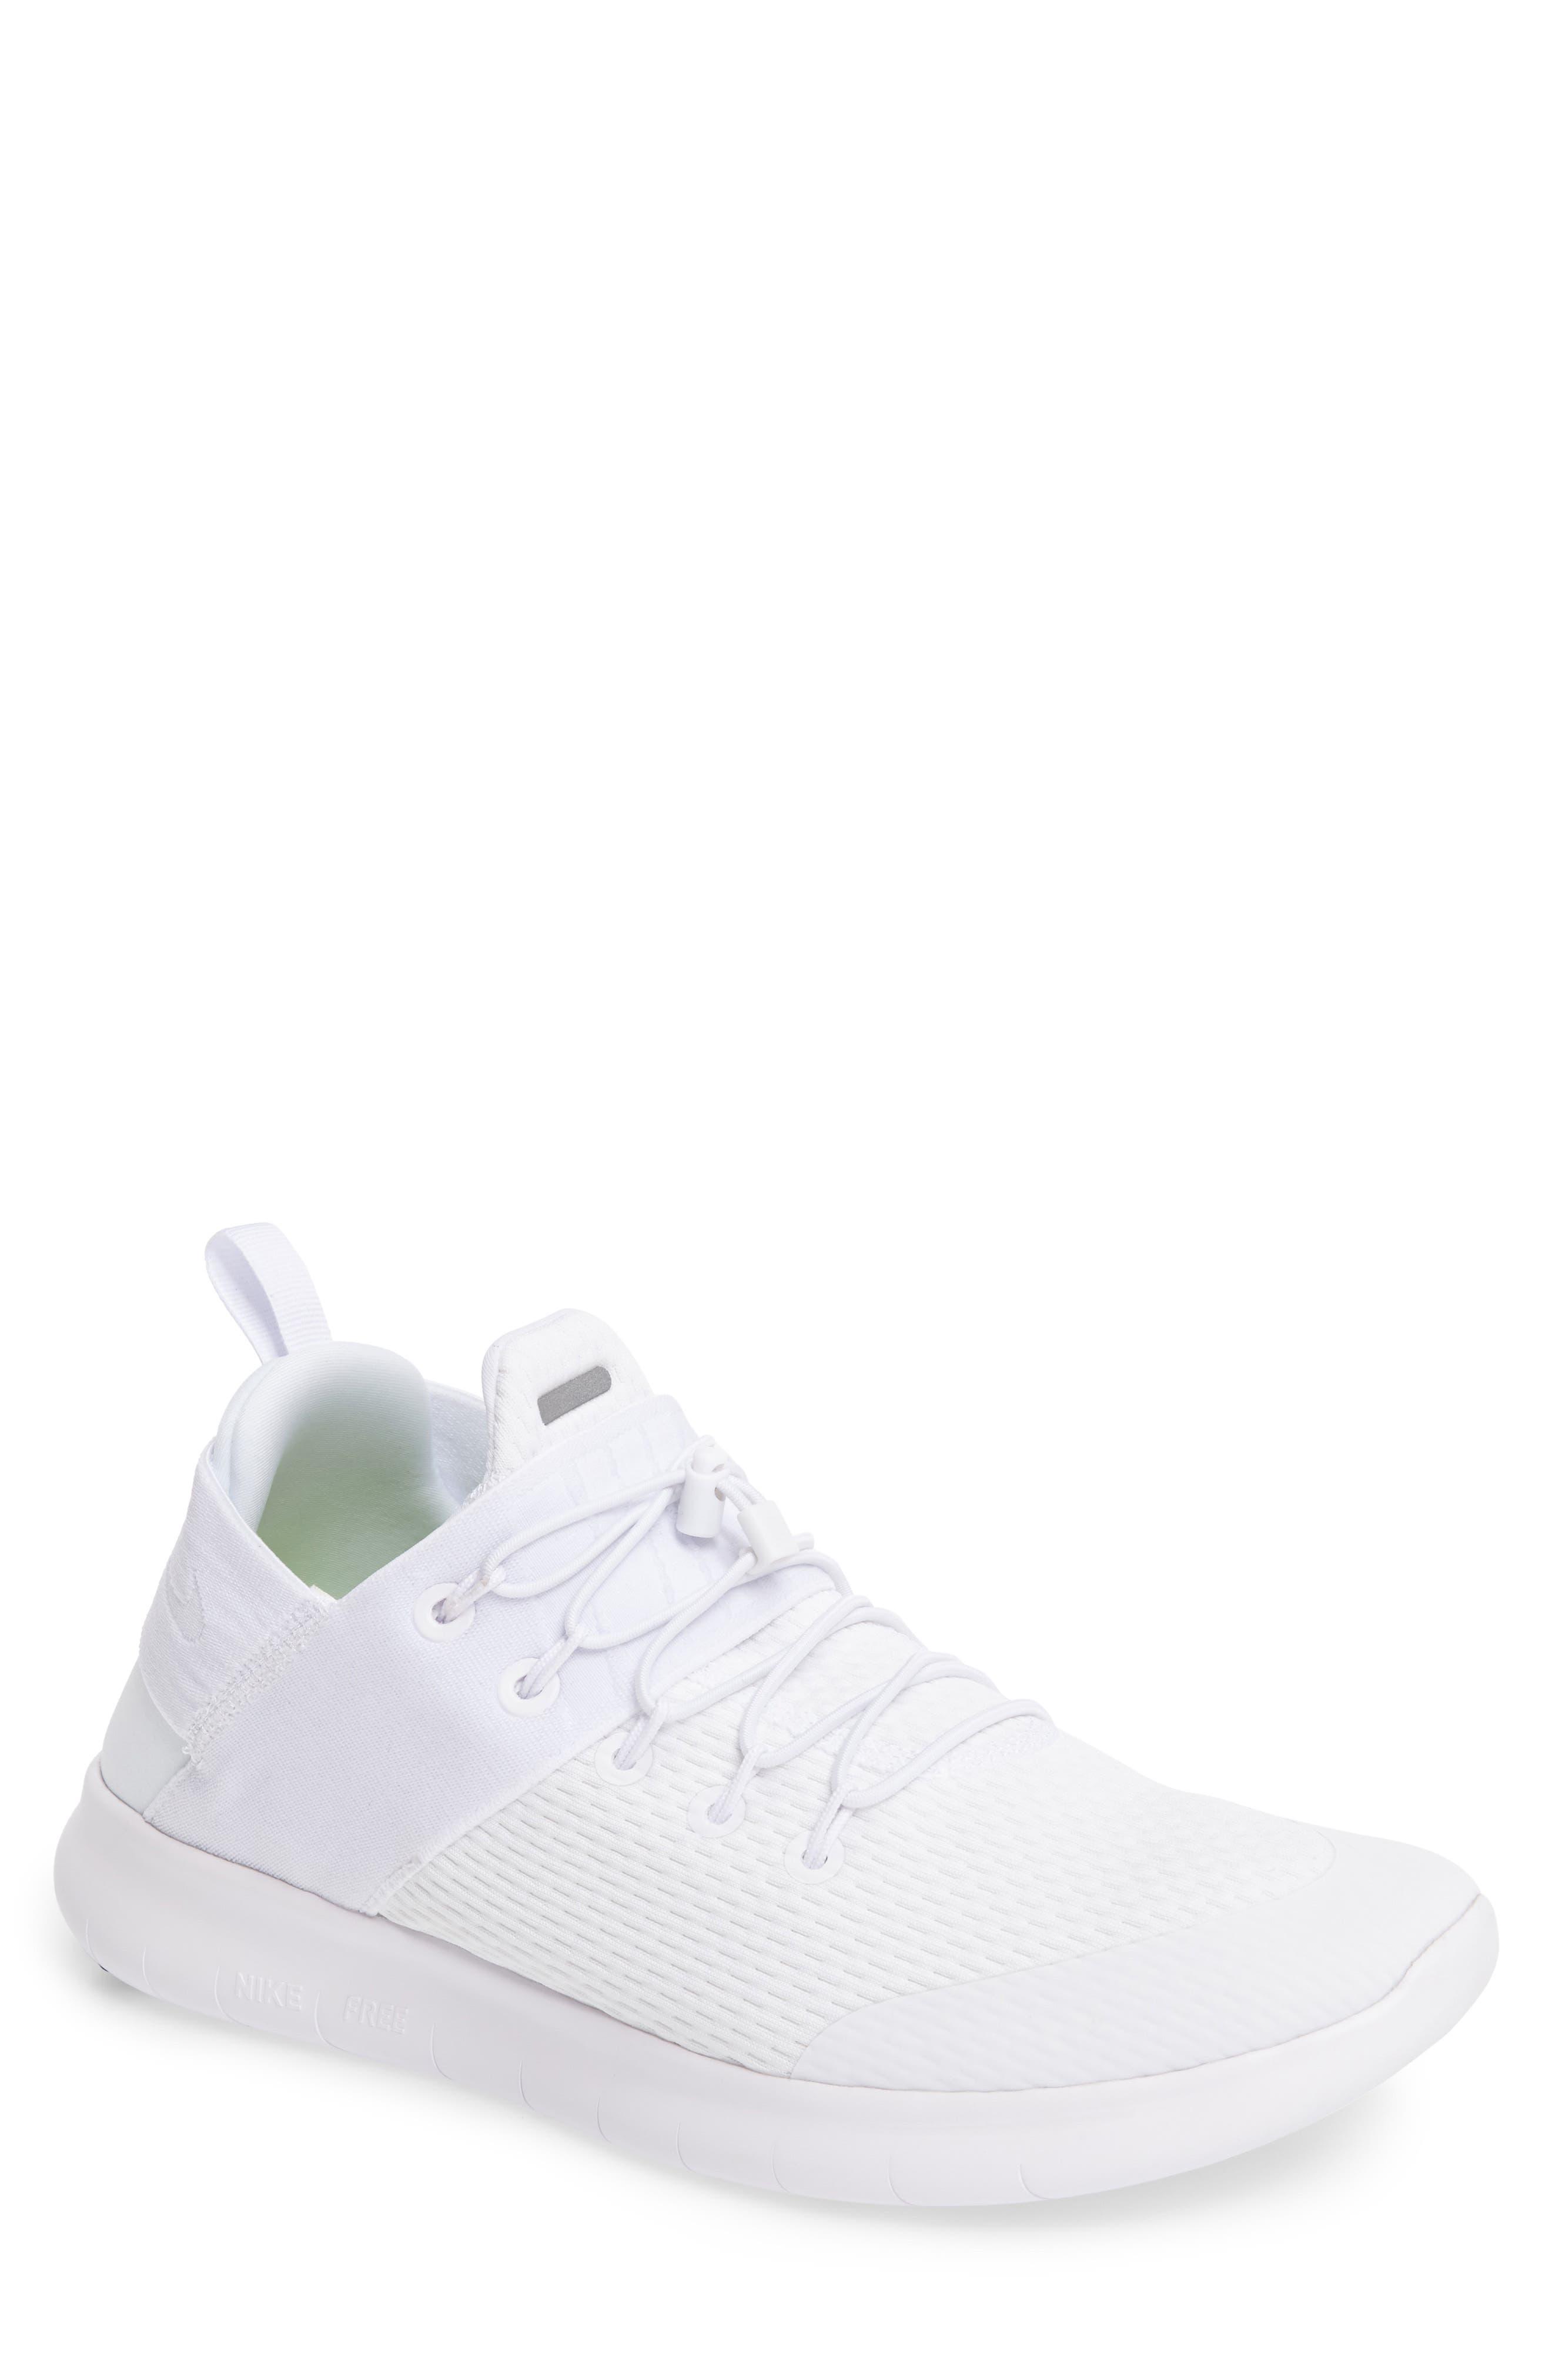 Free RN CMTR 2 Running Shoe,                             Main thumbnail 1, color,                             White/ White/ Platinum/ Grey